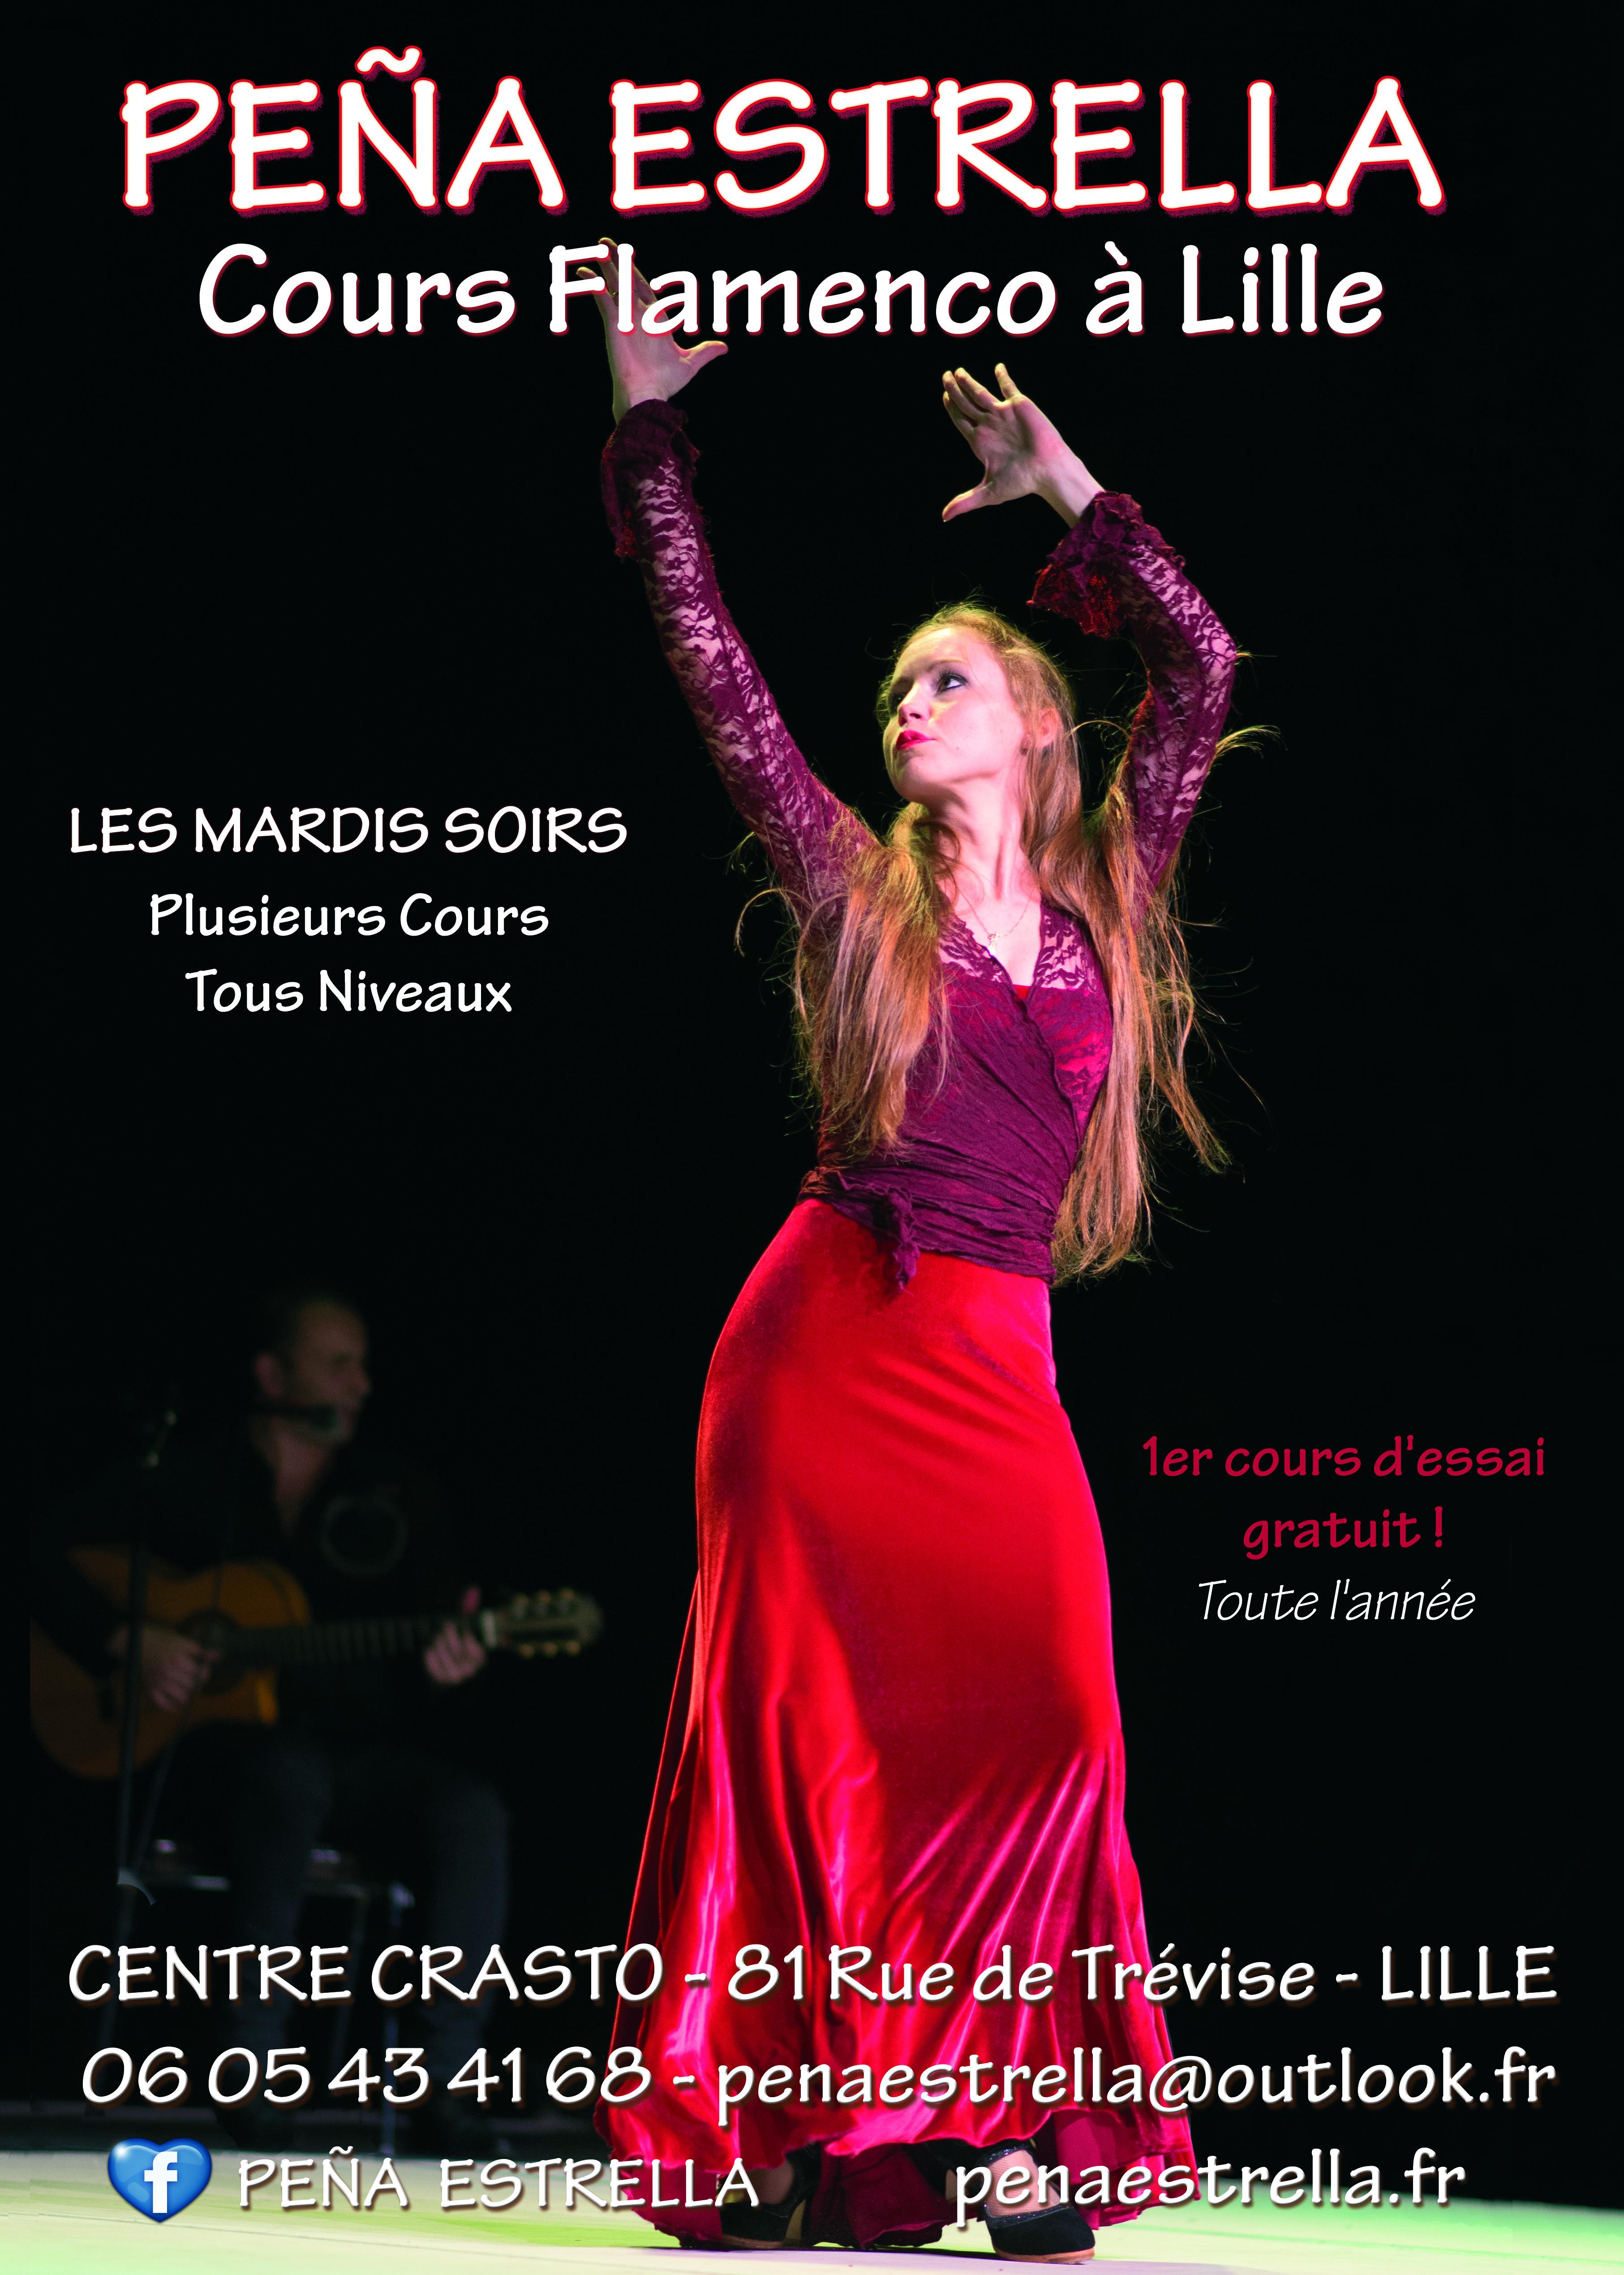 Flamenco Lille Cours  Hauts de France Nord pas de Calais Picardie Peña Estrella